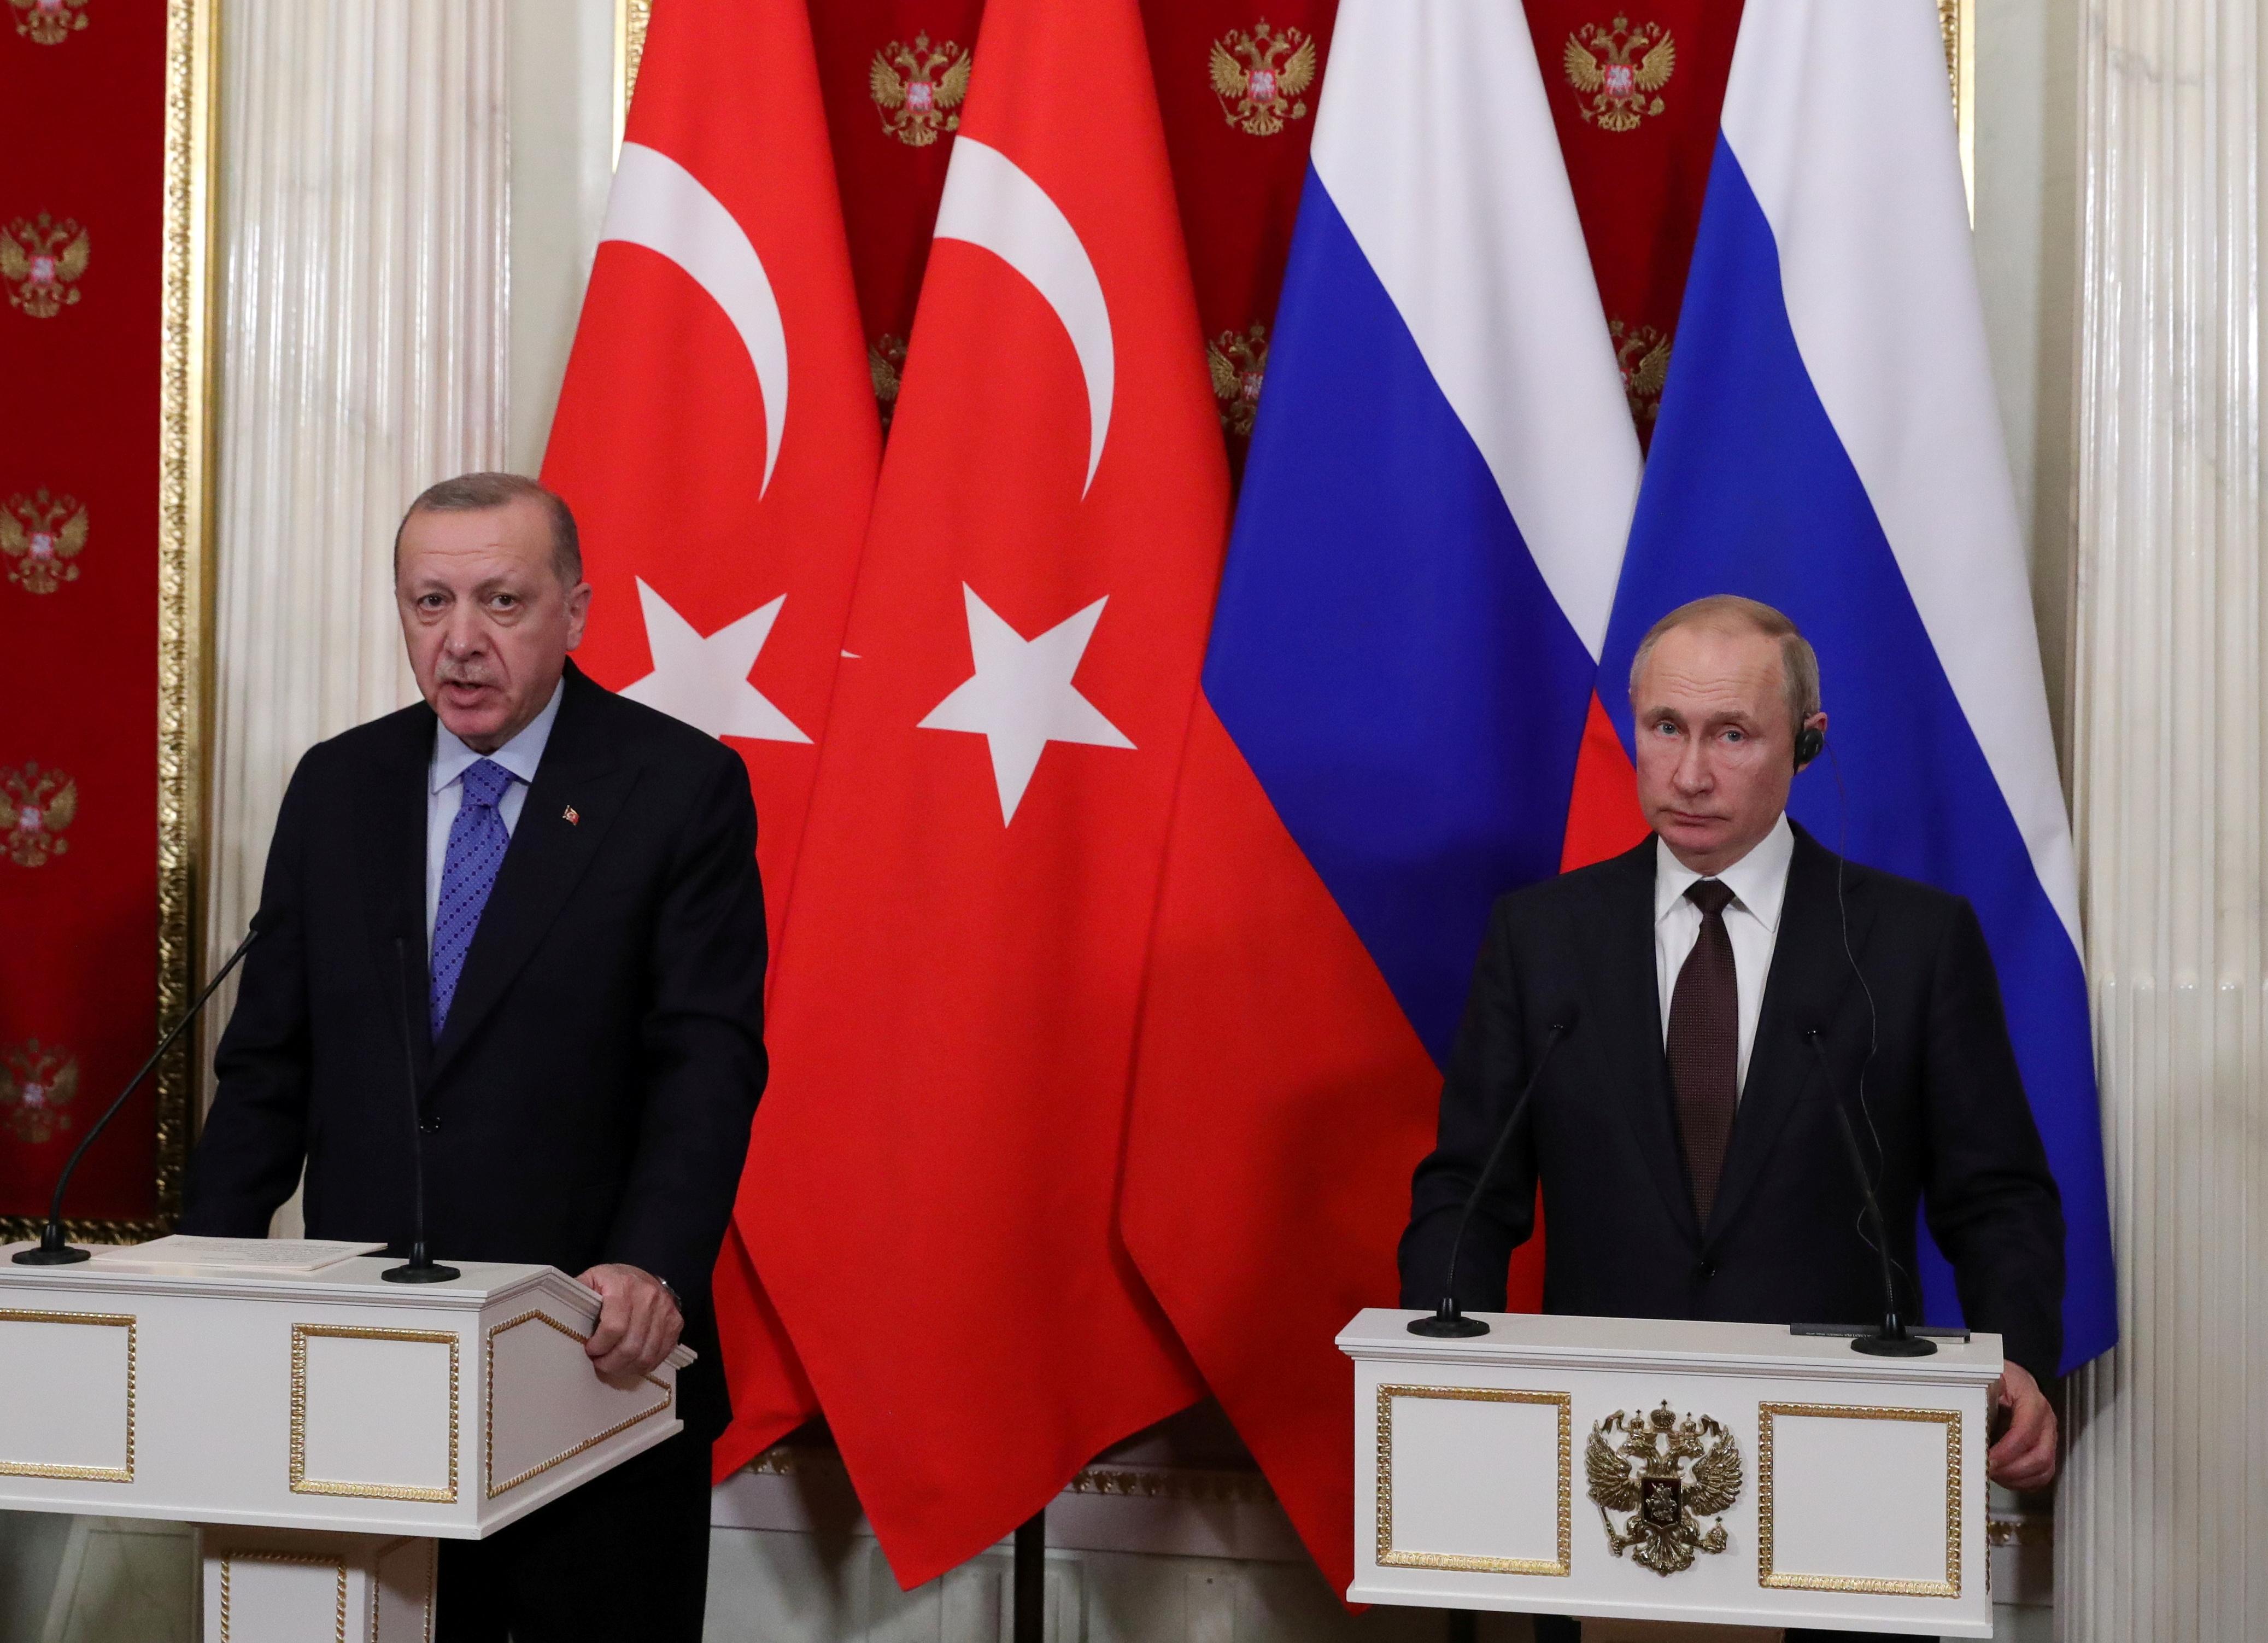 Russian President Vladimir Putin and Turkish President Tayyip Erdogan attend a news conference following their talks in Moscow, Russia March 5, 2020. Sputnik/Mikhail Klimentyev/Kremlin via REUTERS